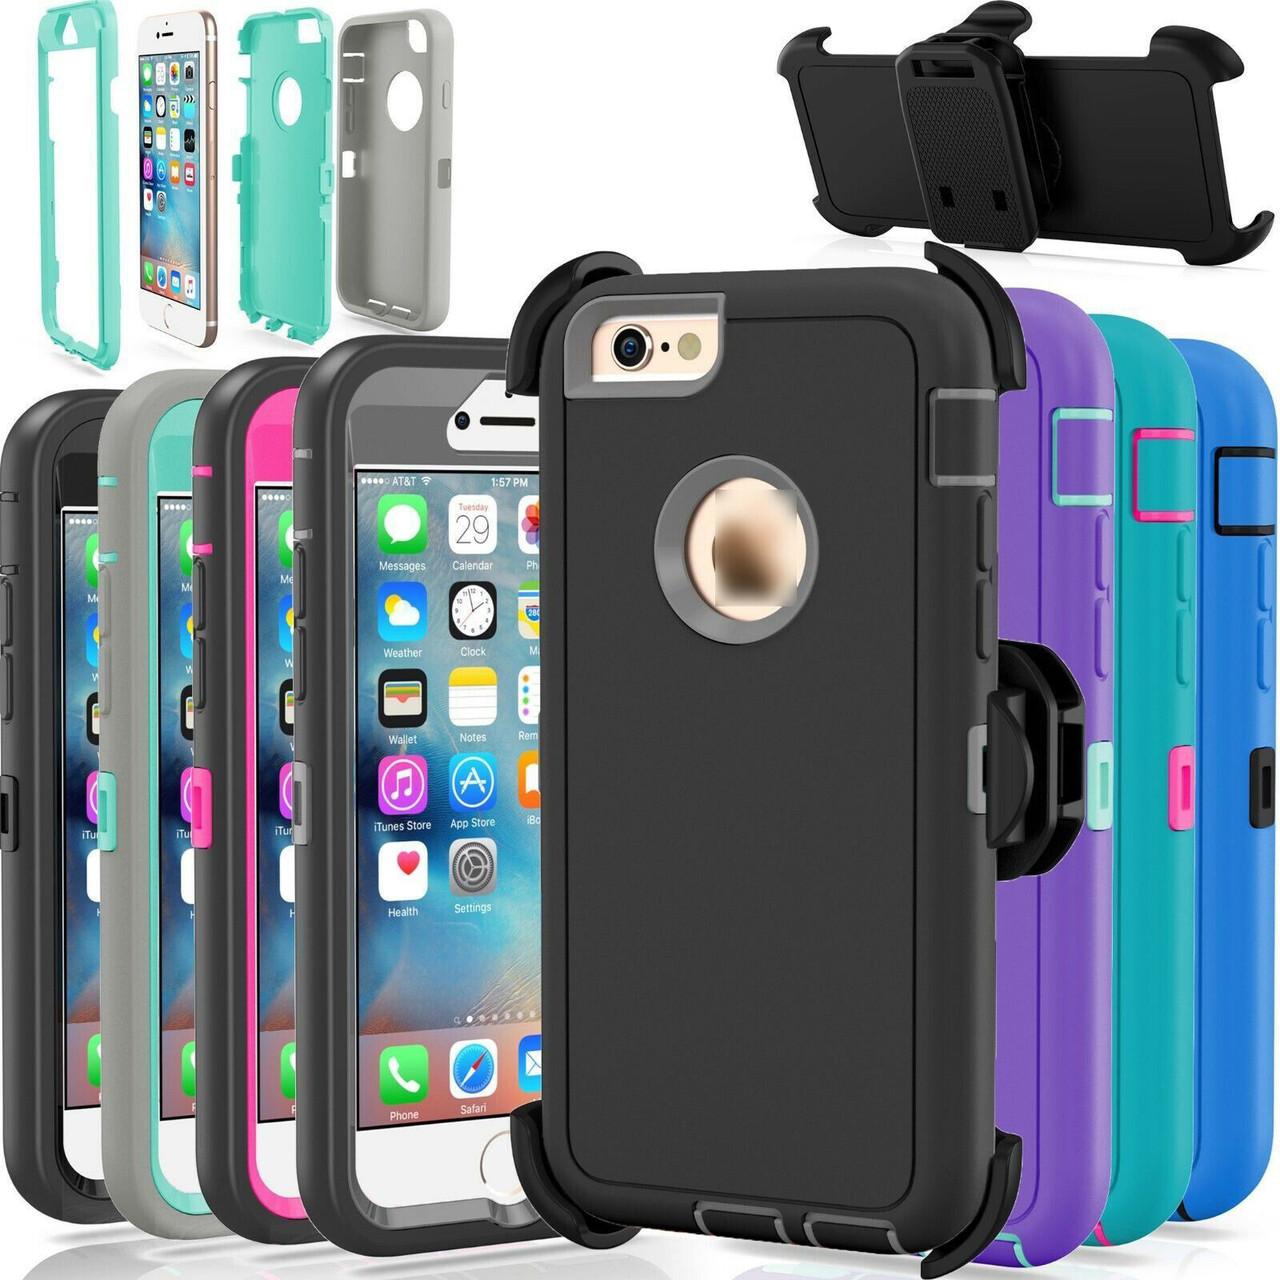 For Apple iPhone 6 Plus 6S Plus Case Cover (Fits Otterbox Defender Belt Clip)